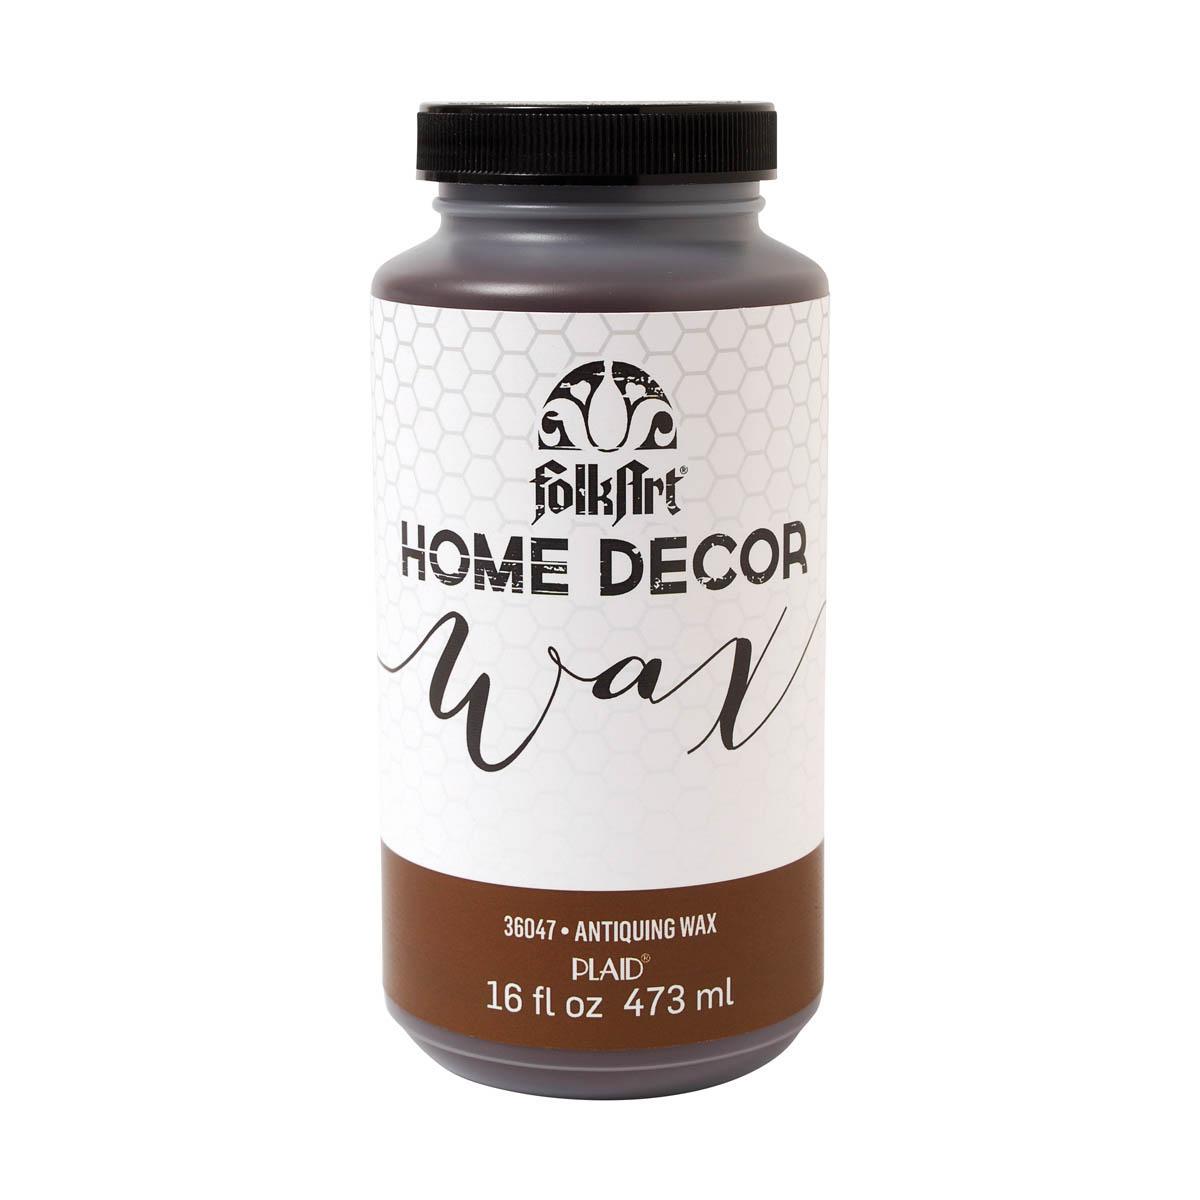 FolkArt ® Home Decor™ Wax - Antiquing, 16 oz.